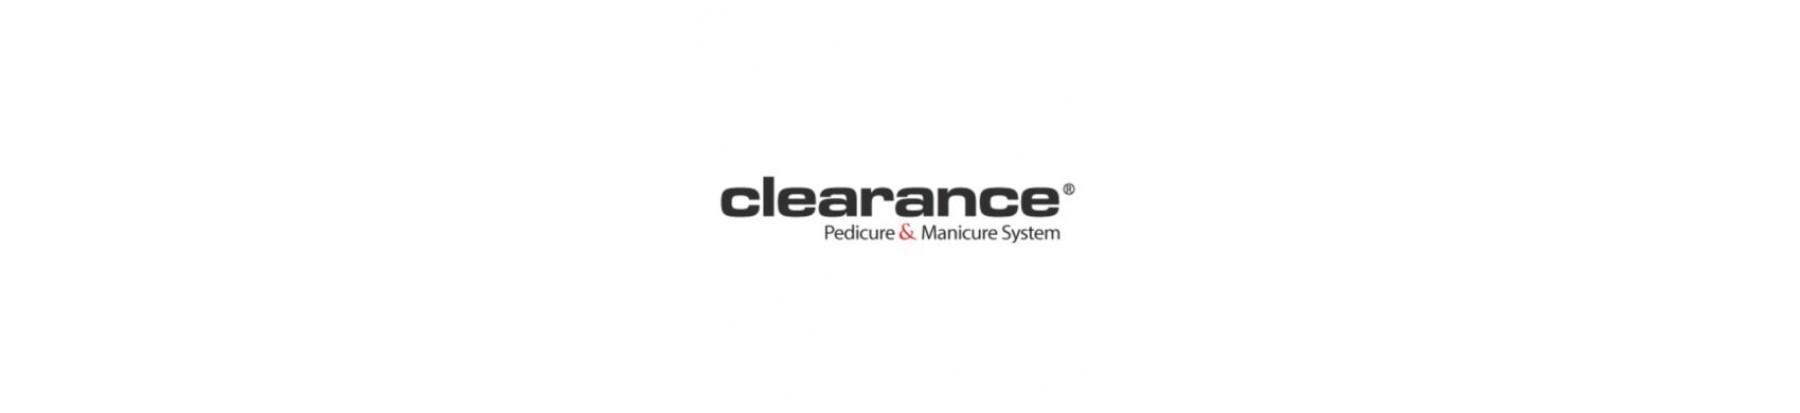 Clearance (лечебный педикюр и маникюр)